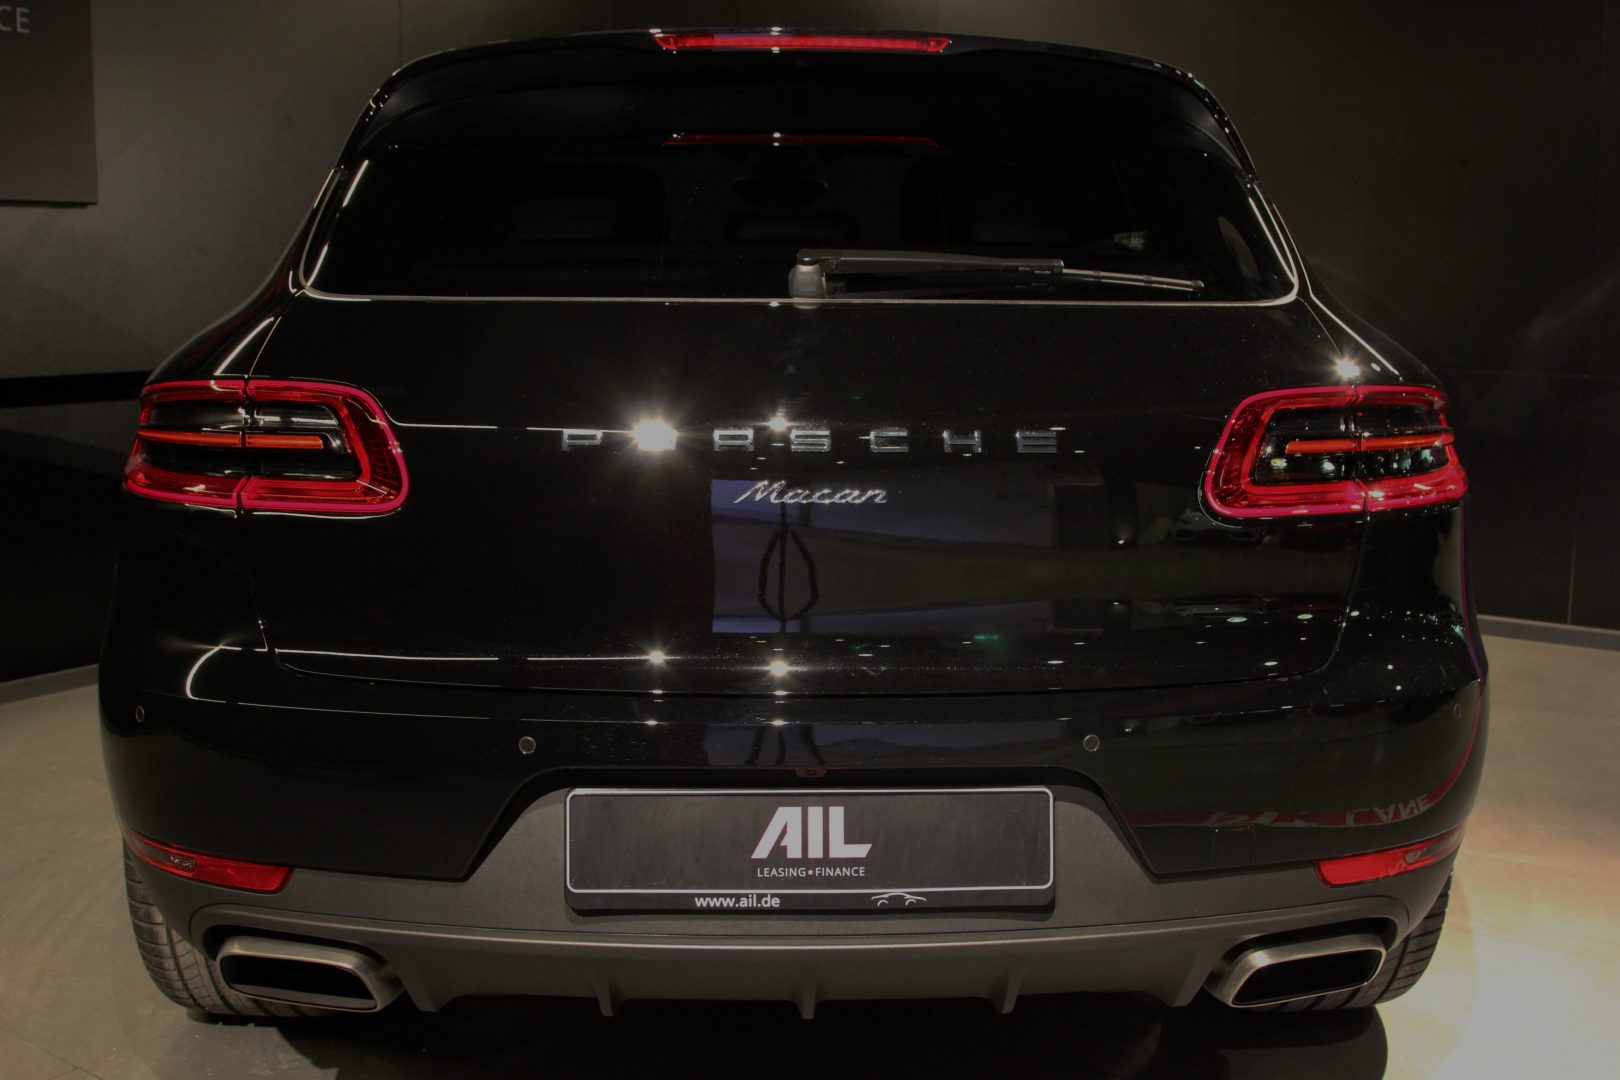 AIL Porsche Macan Panorama Bose LED 5